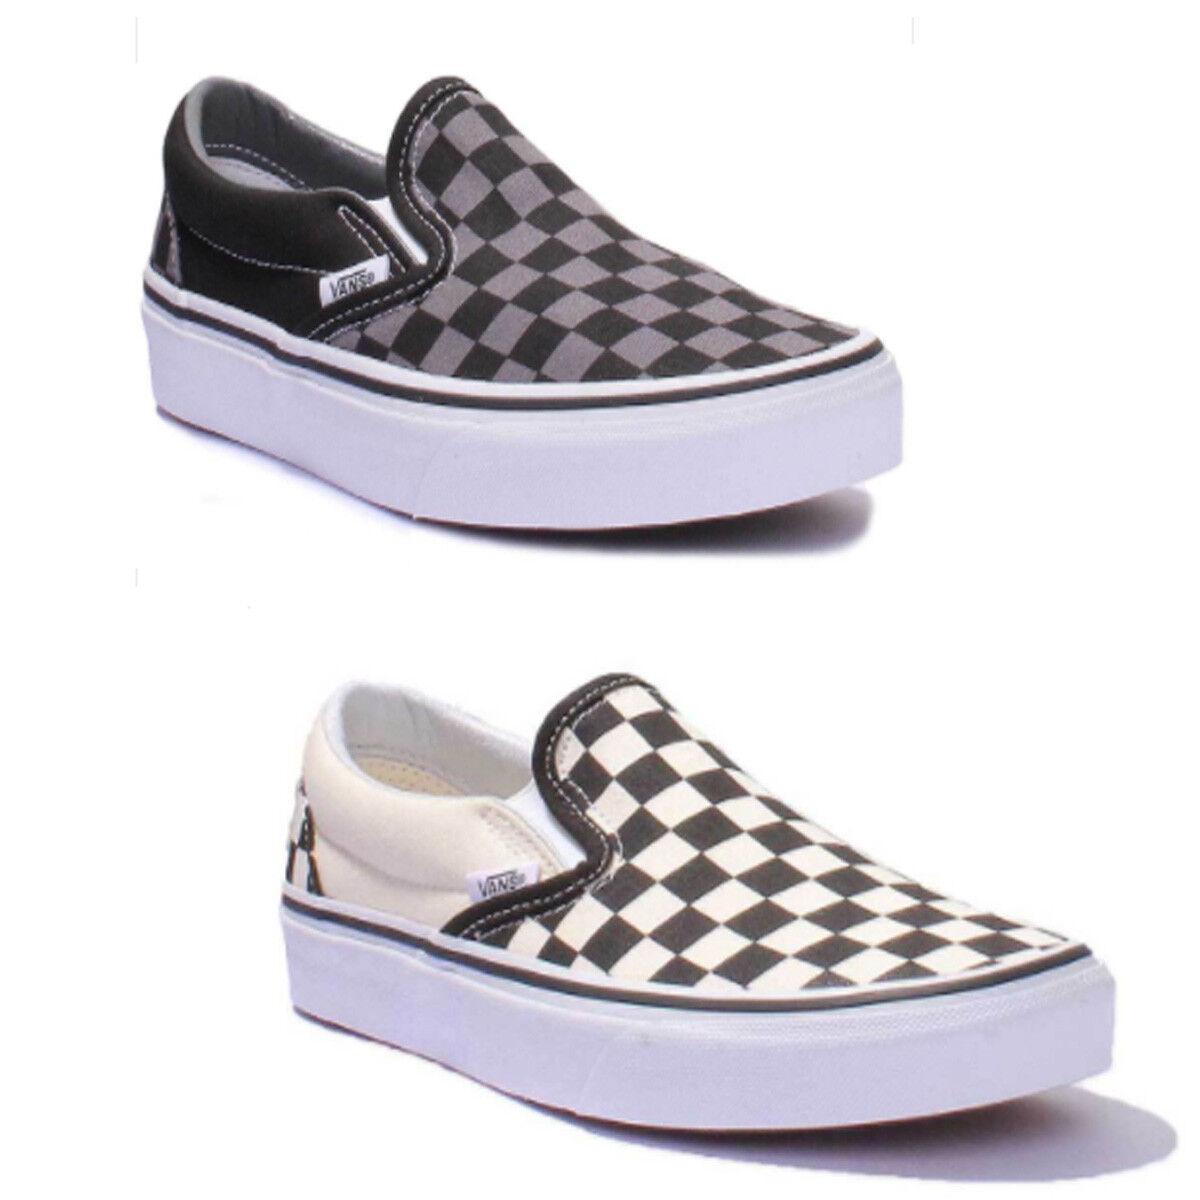 Vans Checkerboard Slip On Men Canvas Trainers 7 - 12.5